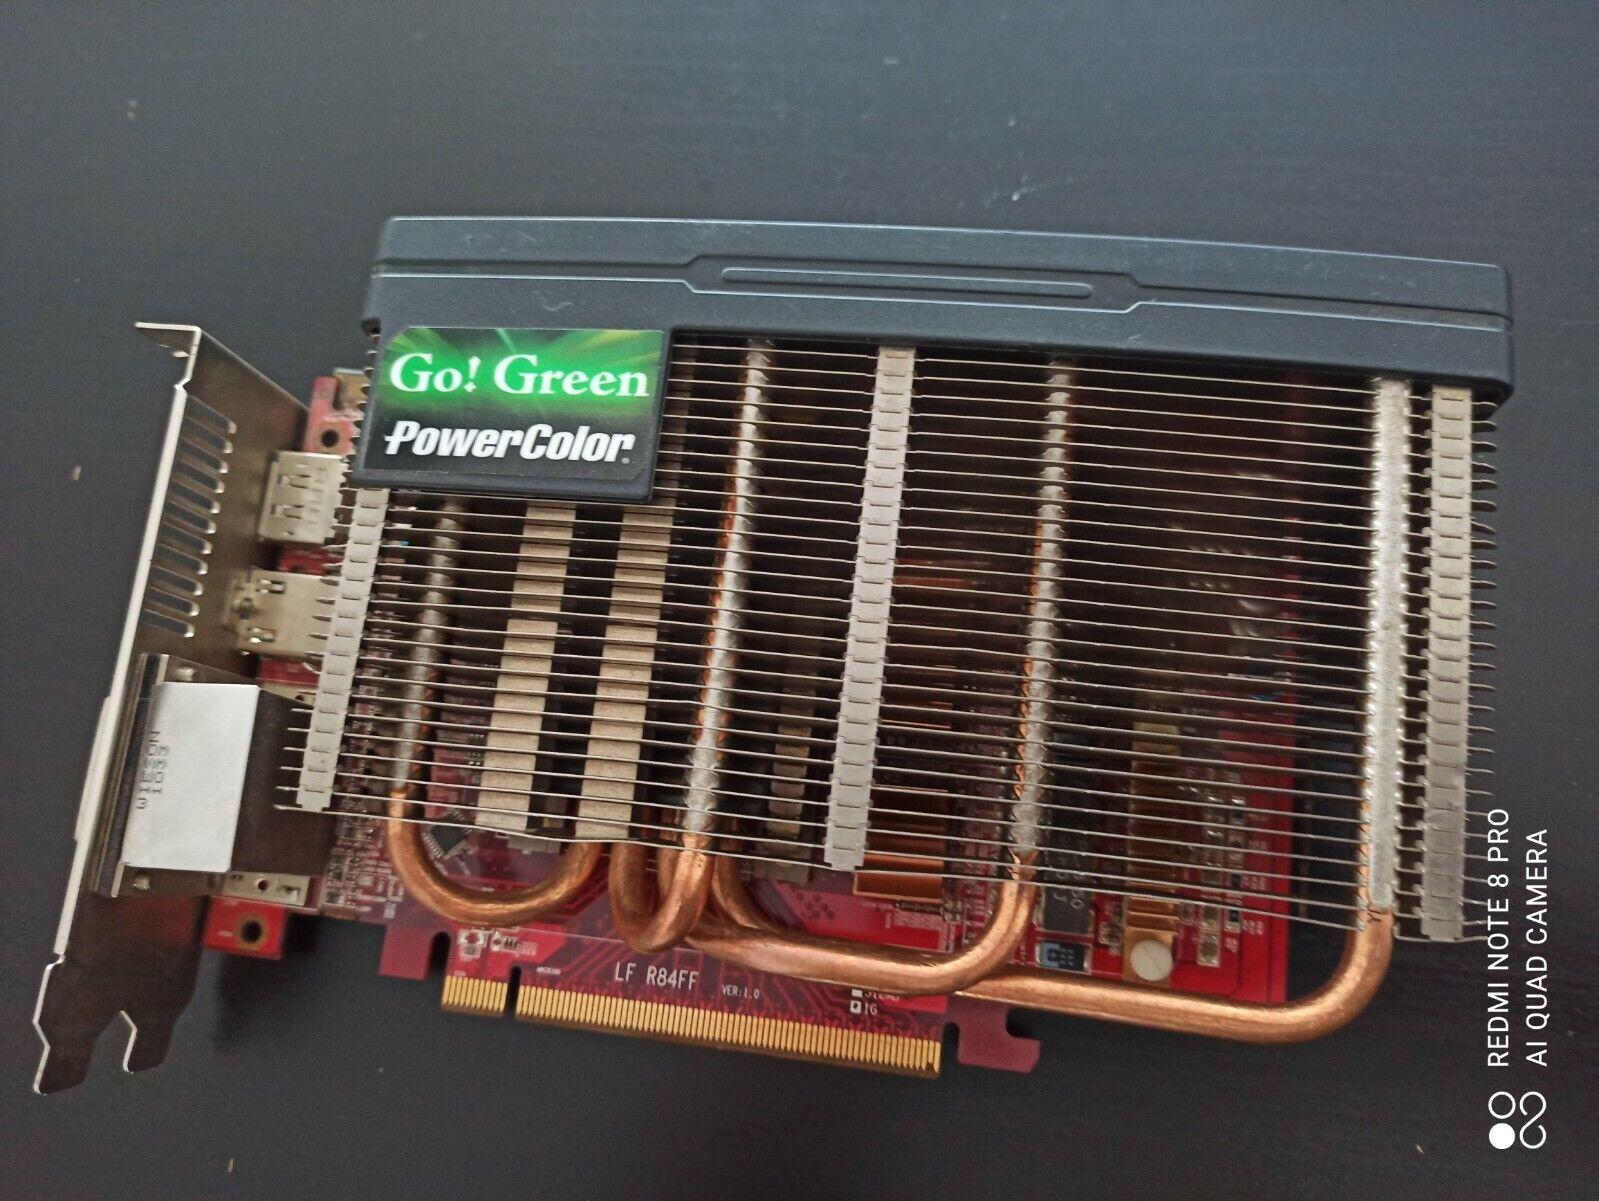 Grafikkarte  Radeon AX5750 1GBD5-NS3DH  passiv gekühlt  2x DVI  HDMI DP